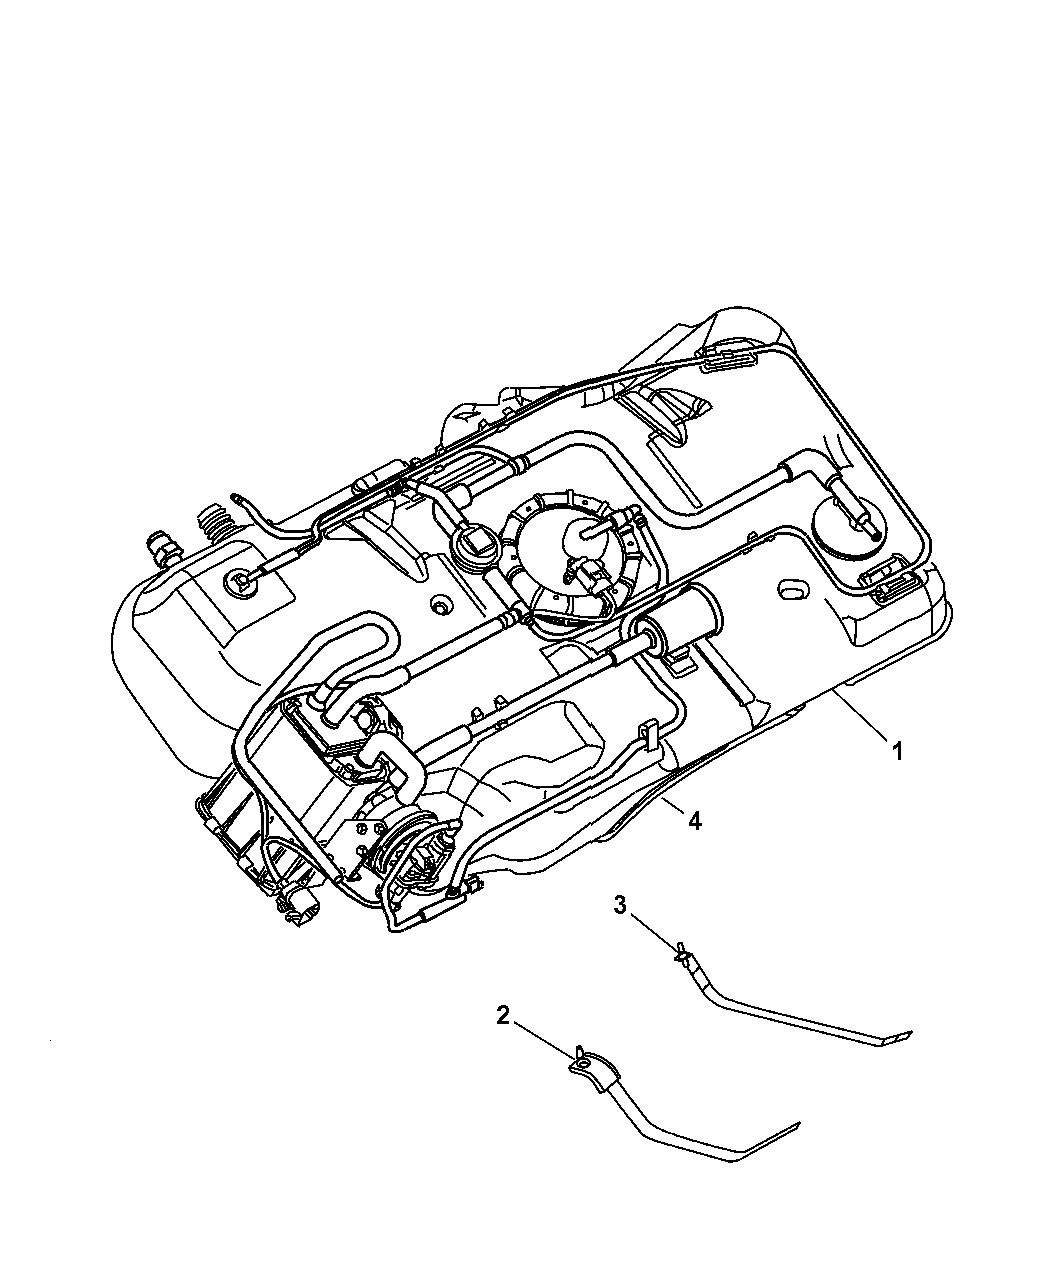 03 pt cruiser wiring diagram 2003 chrysler pt cruiser fuel tank mopar parts giant  2003 chrysler pt cruiser fuel tank